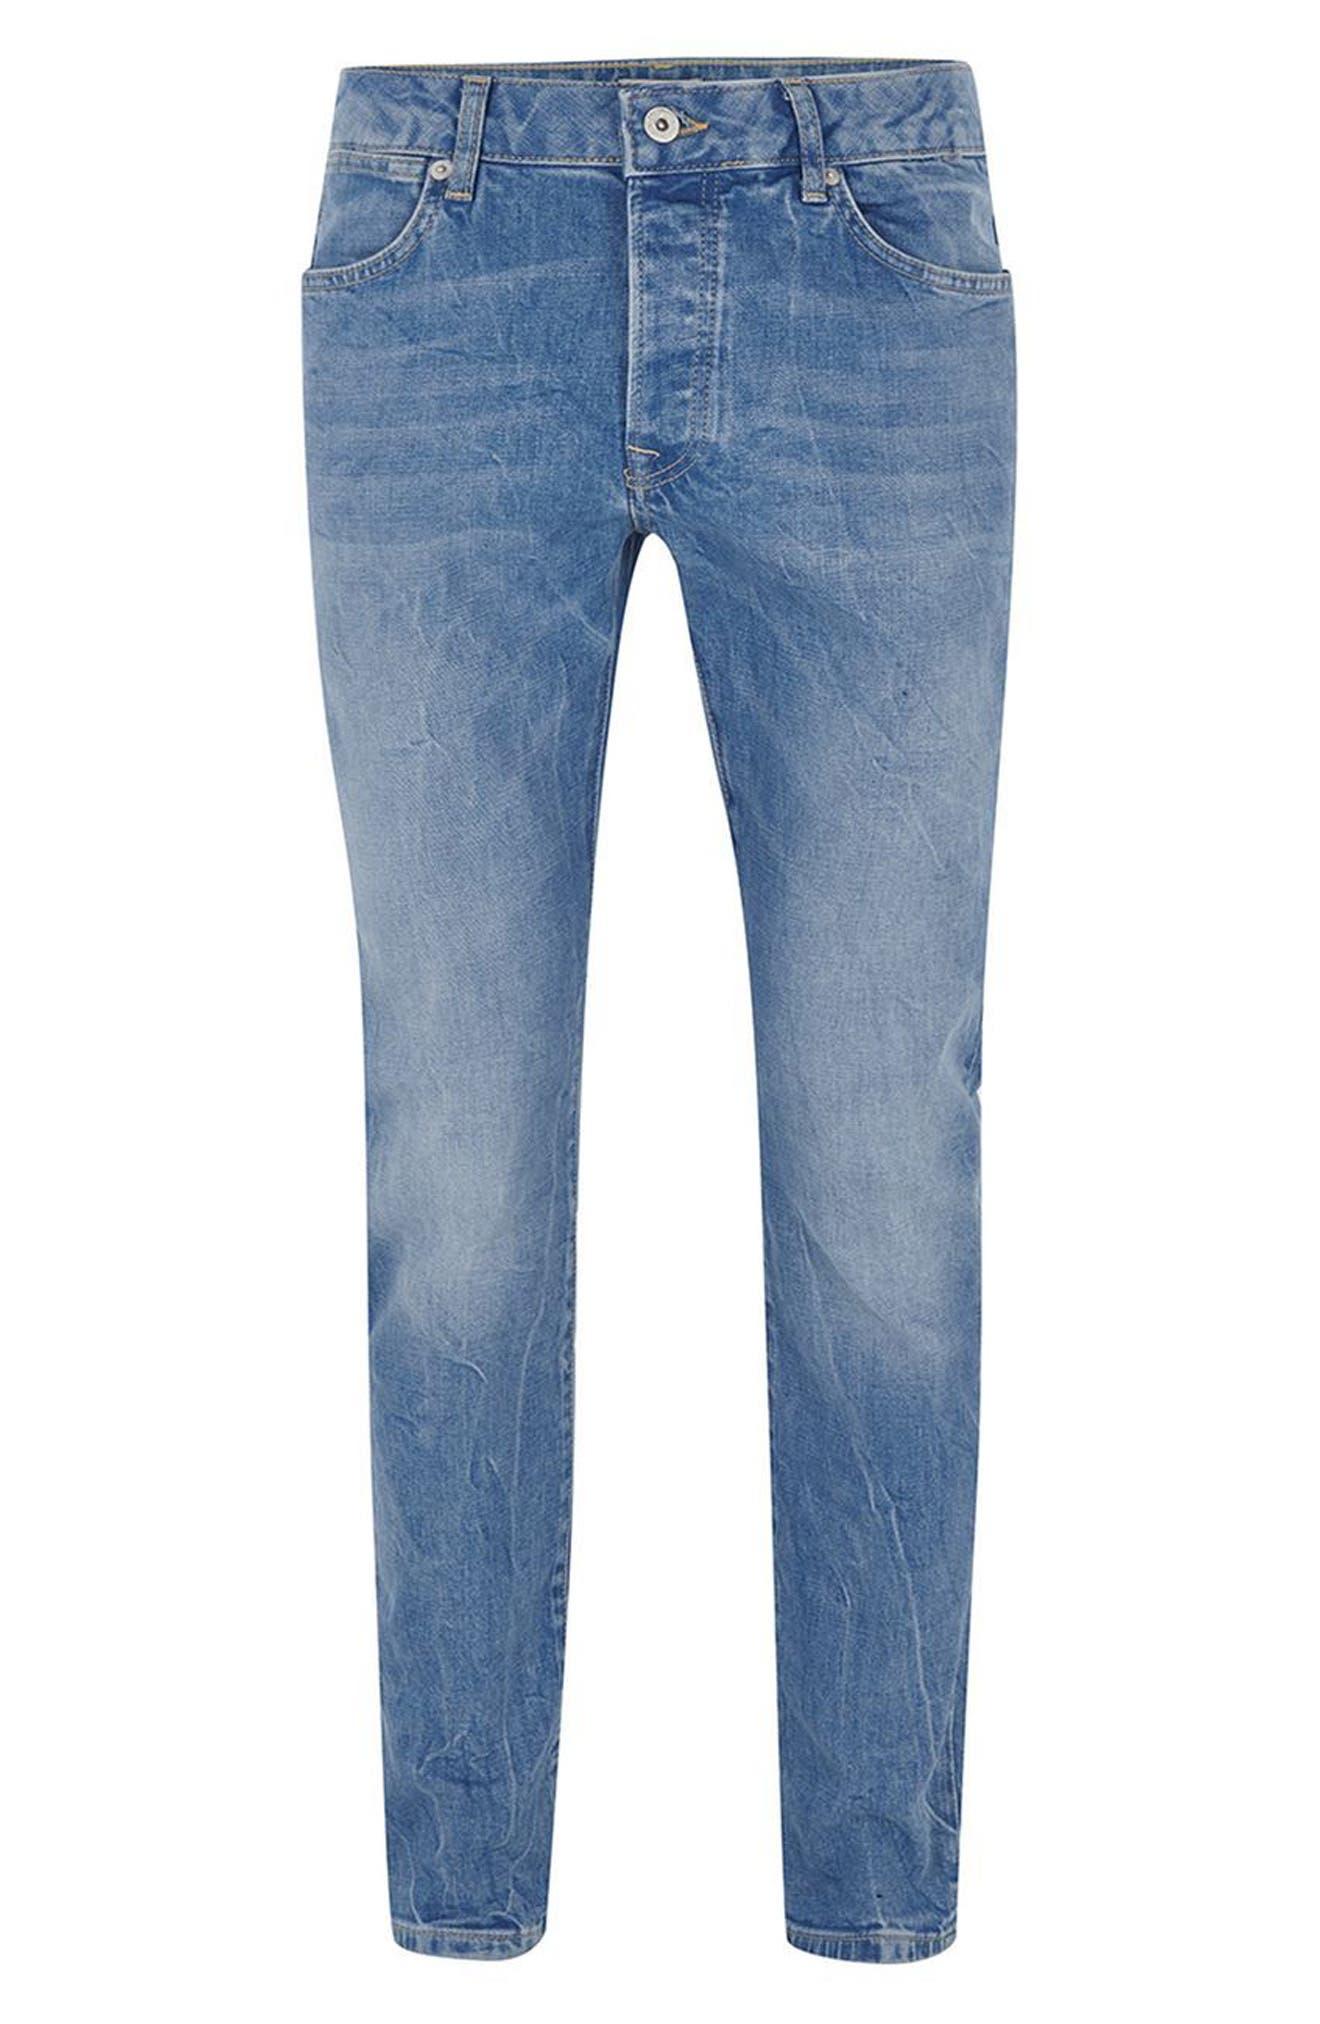 Stretch Slim Leg Jeans,                             Alternate thumbnail 4, color,                             430